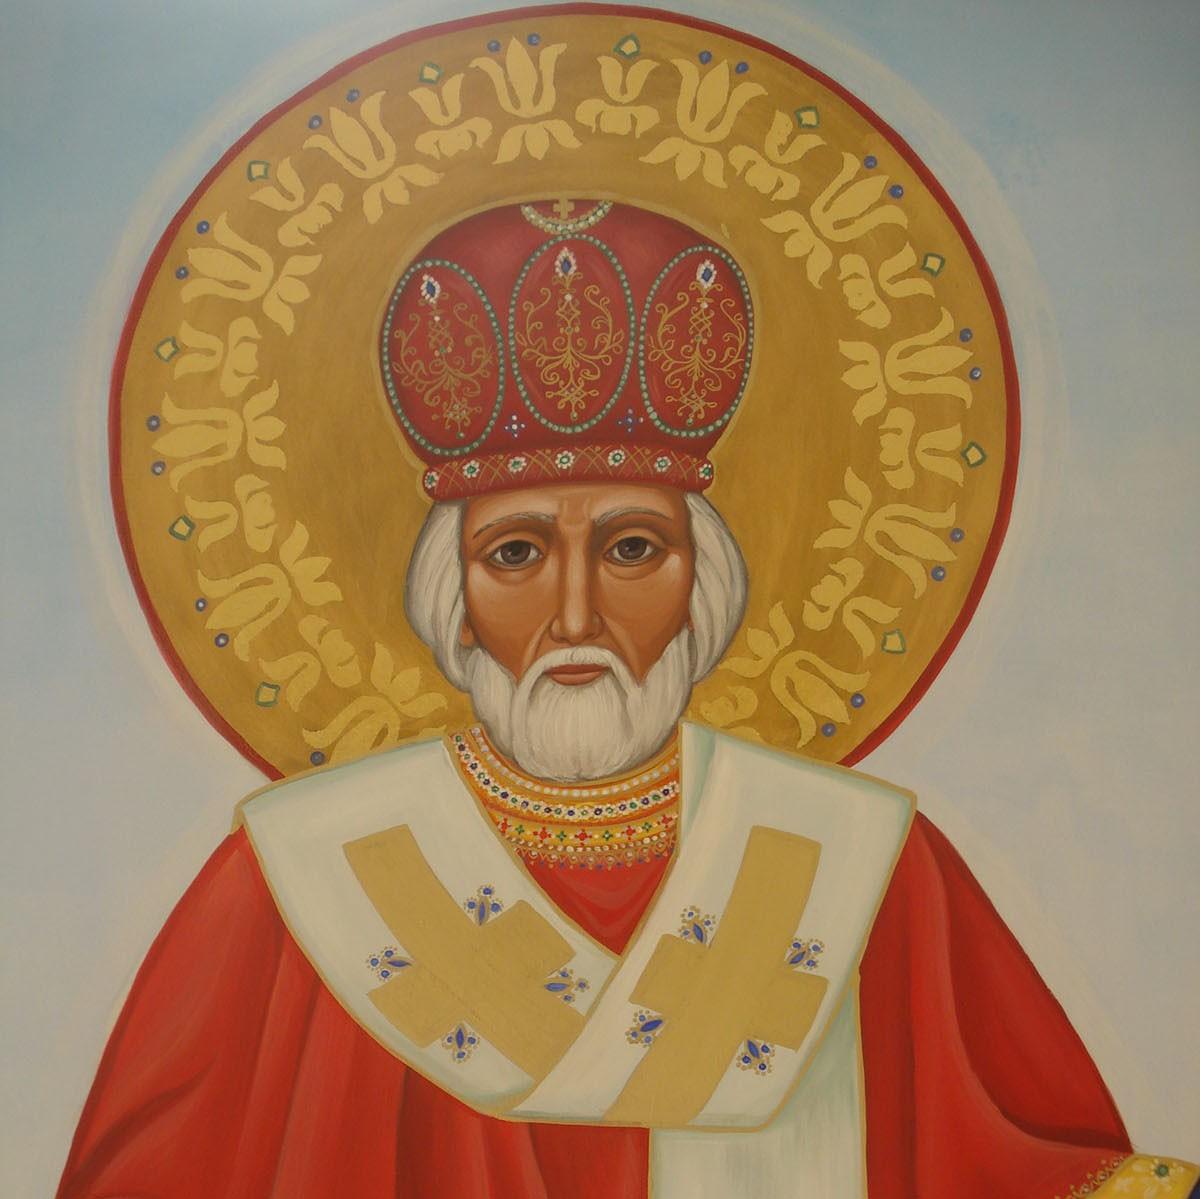 Nicolaus Ikon Malszeminar – 4-6 December